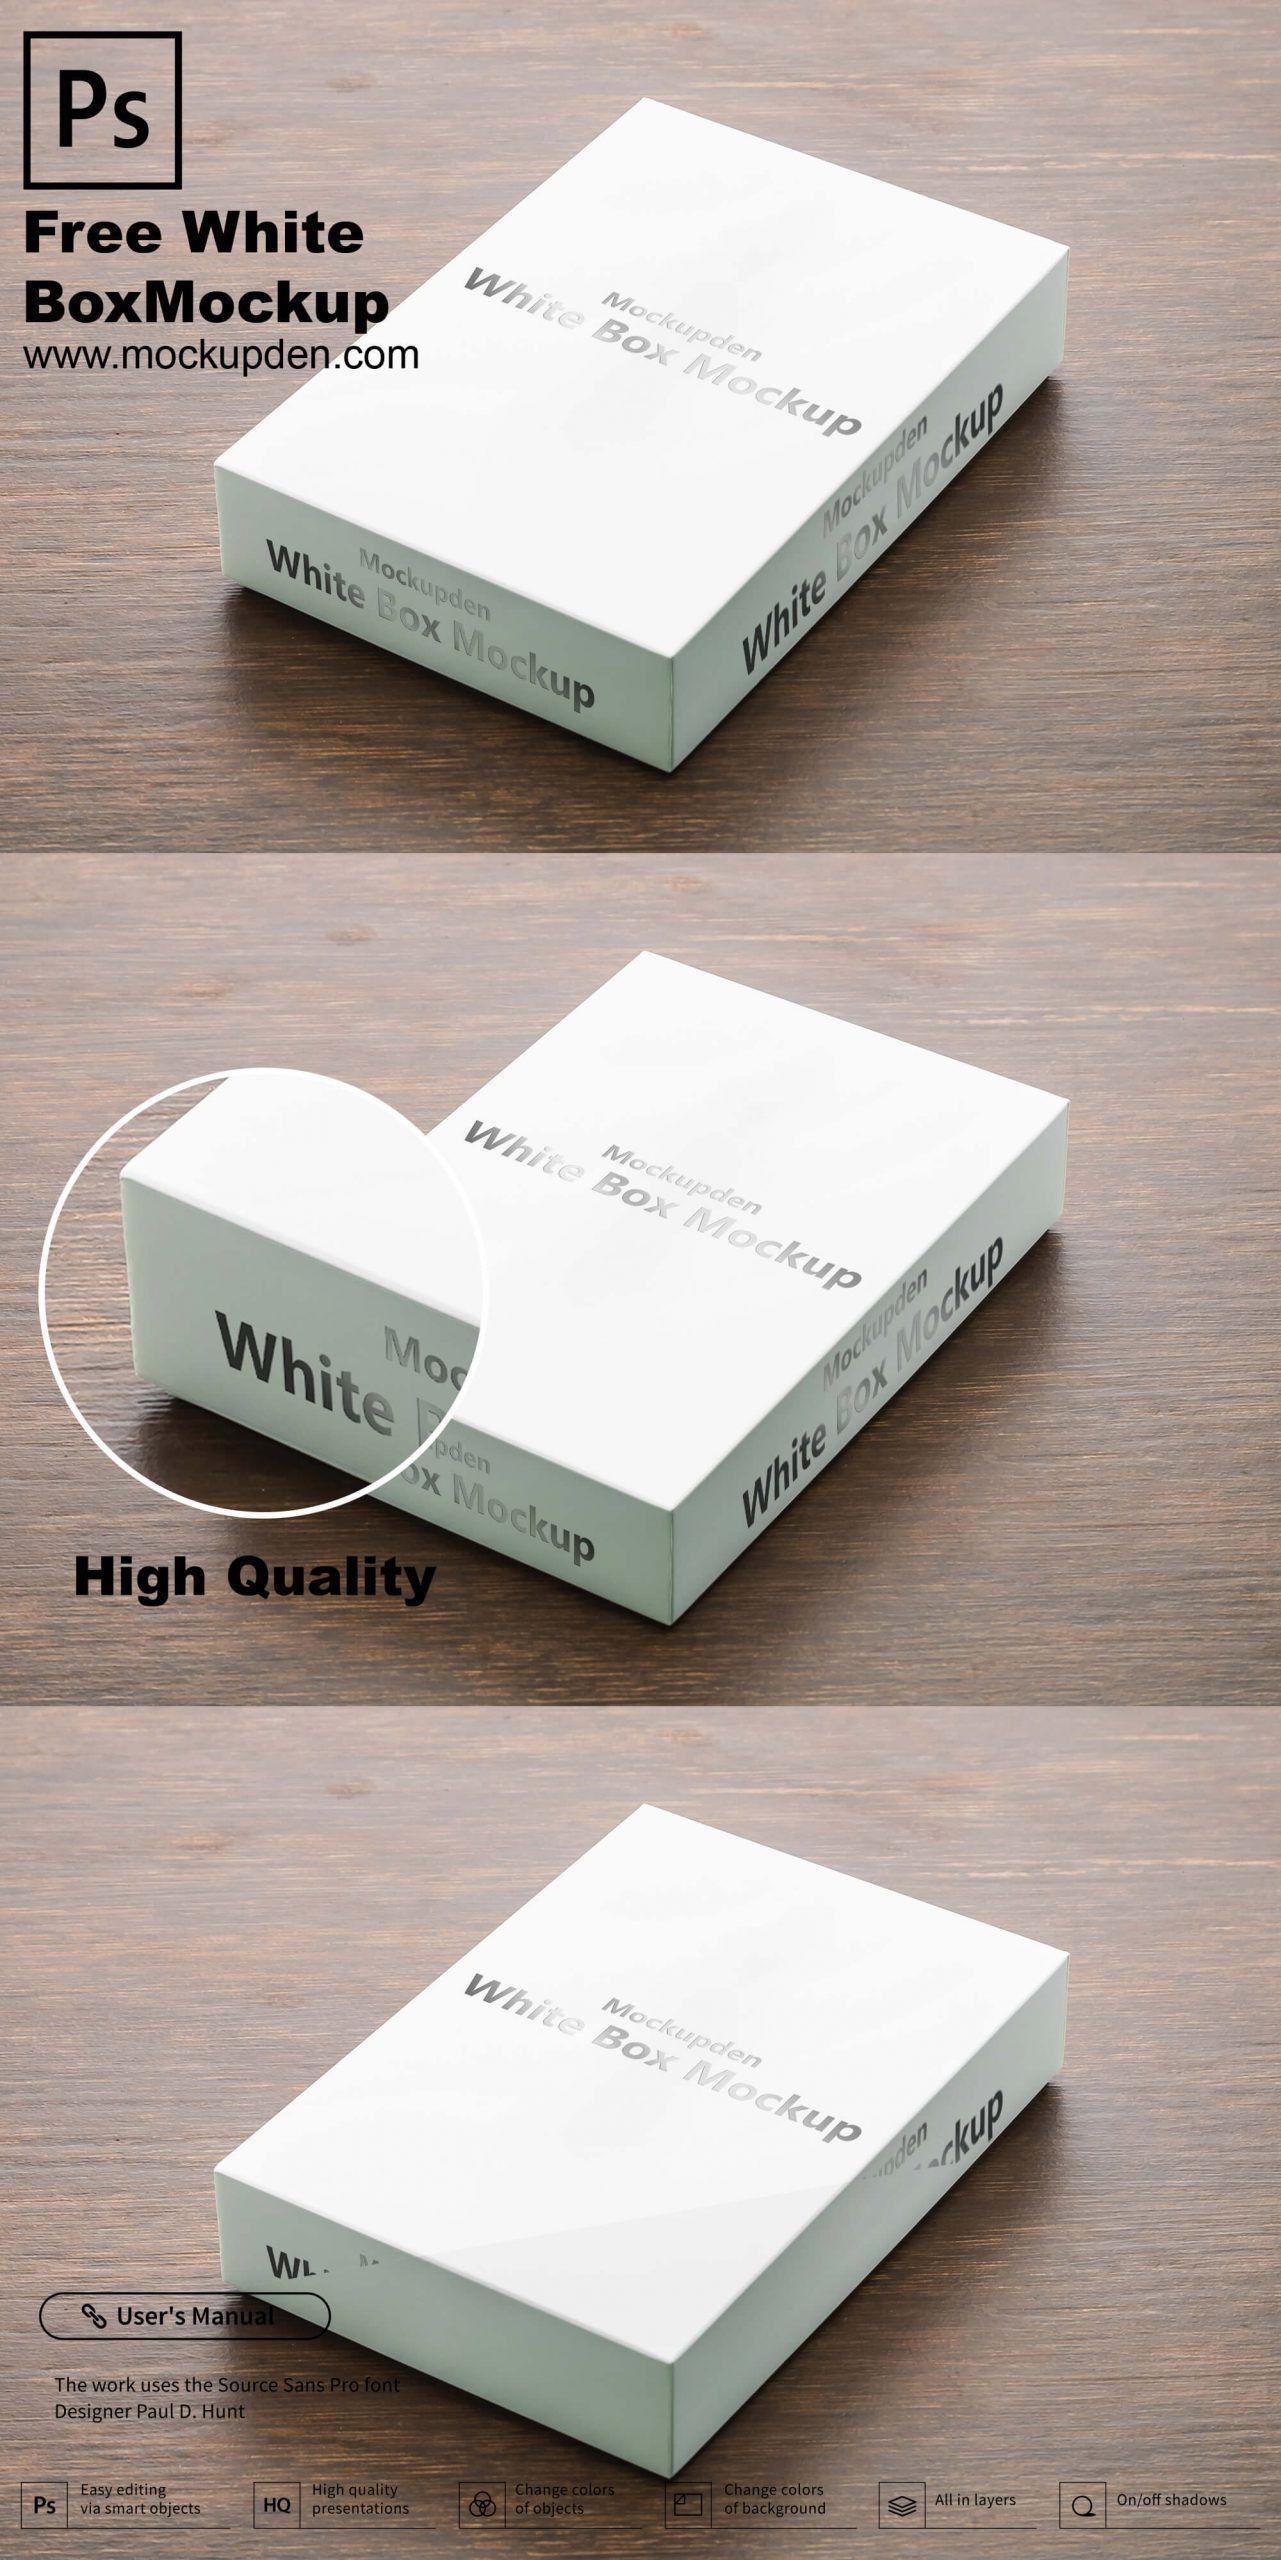 Download Free White Box Mockup Psd Template Box Mockup Box Design Templates Mockup Psd